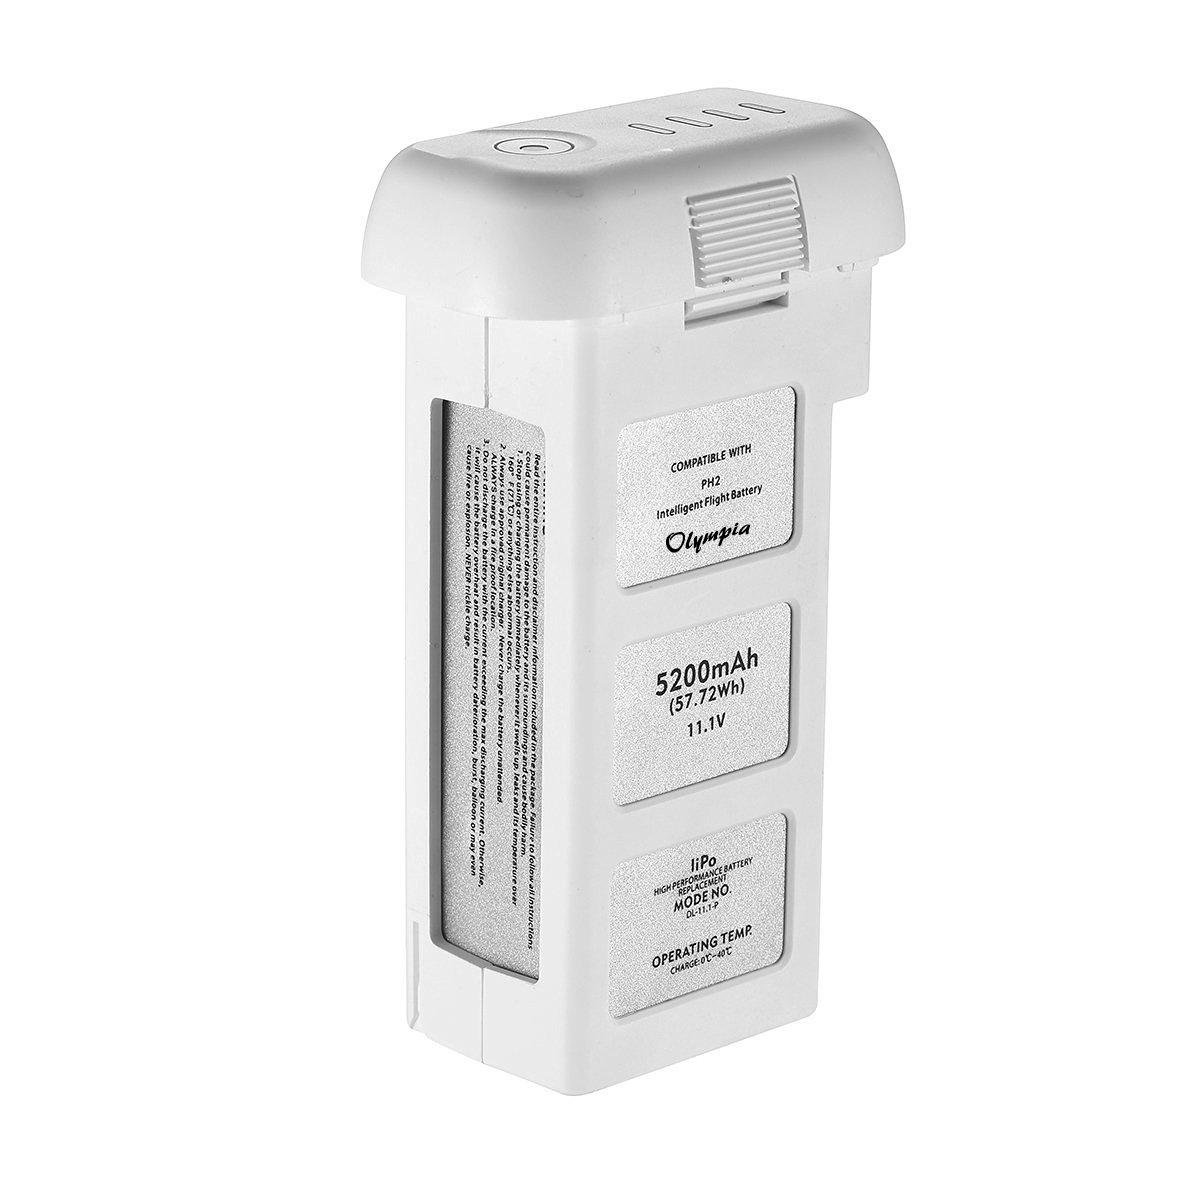 Replacement DJI Phantom 2 Battery (11.1V, 5200mAh, Li-Pol) for Phantom 2, Phantom 2 Vision and Phantom 2 Vision+ Olympia Battery PH2-1pack-4